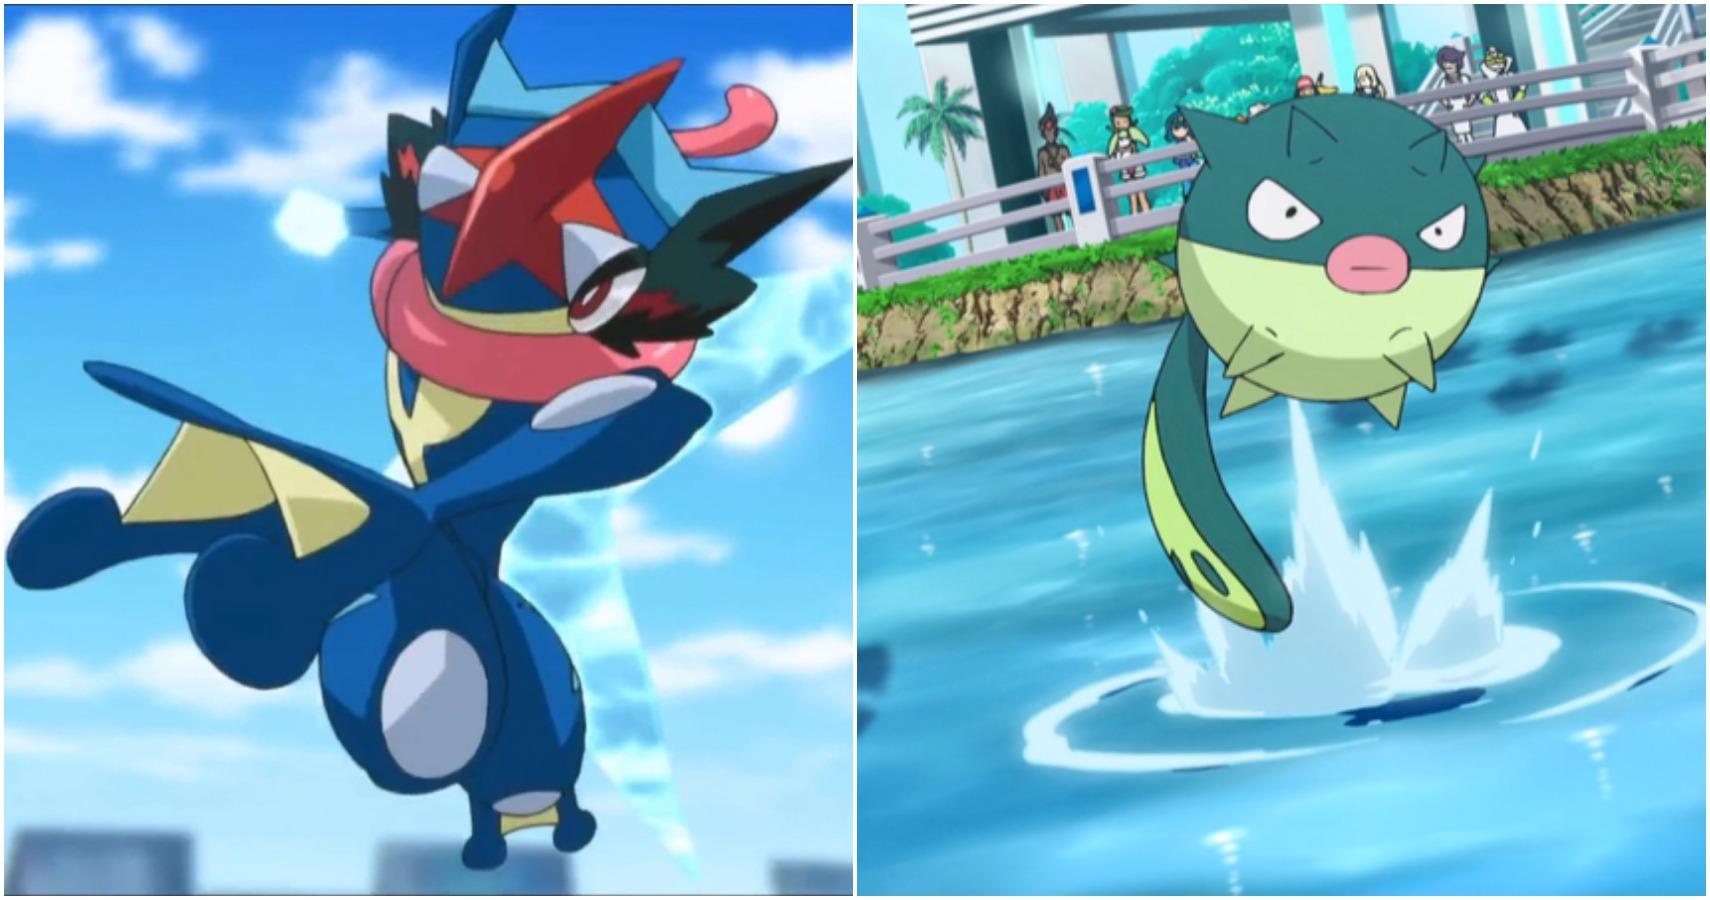 Pokémon: 5 Coolest Water-Type Pokémon Design (& 5 Of The Worst)